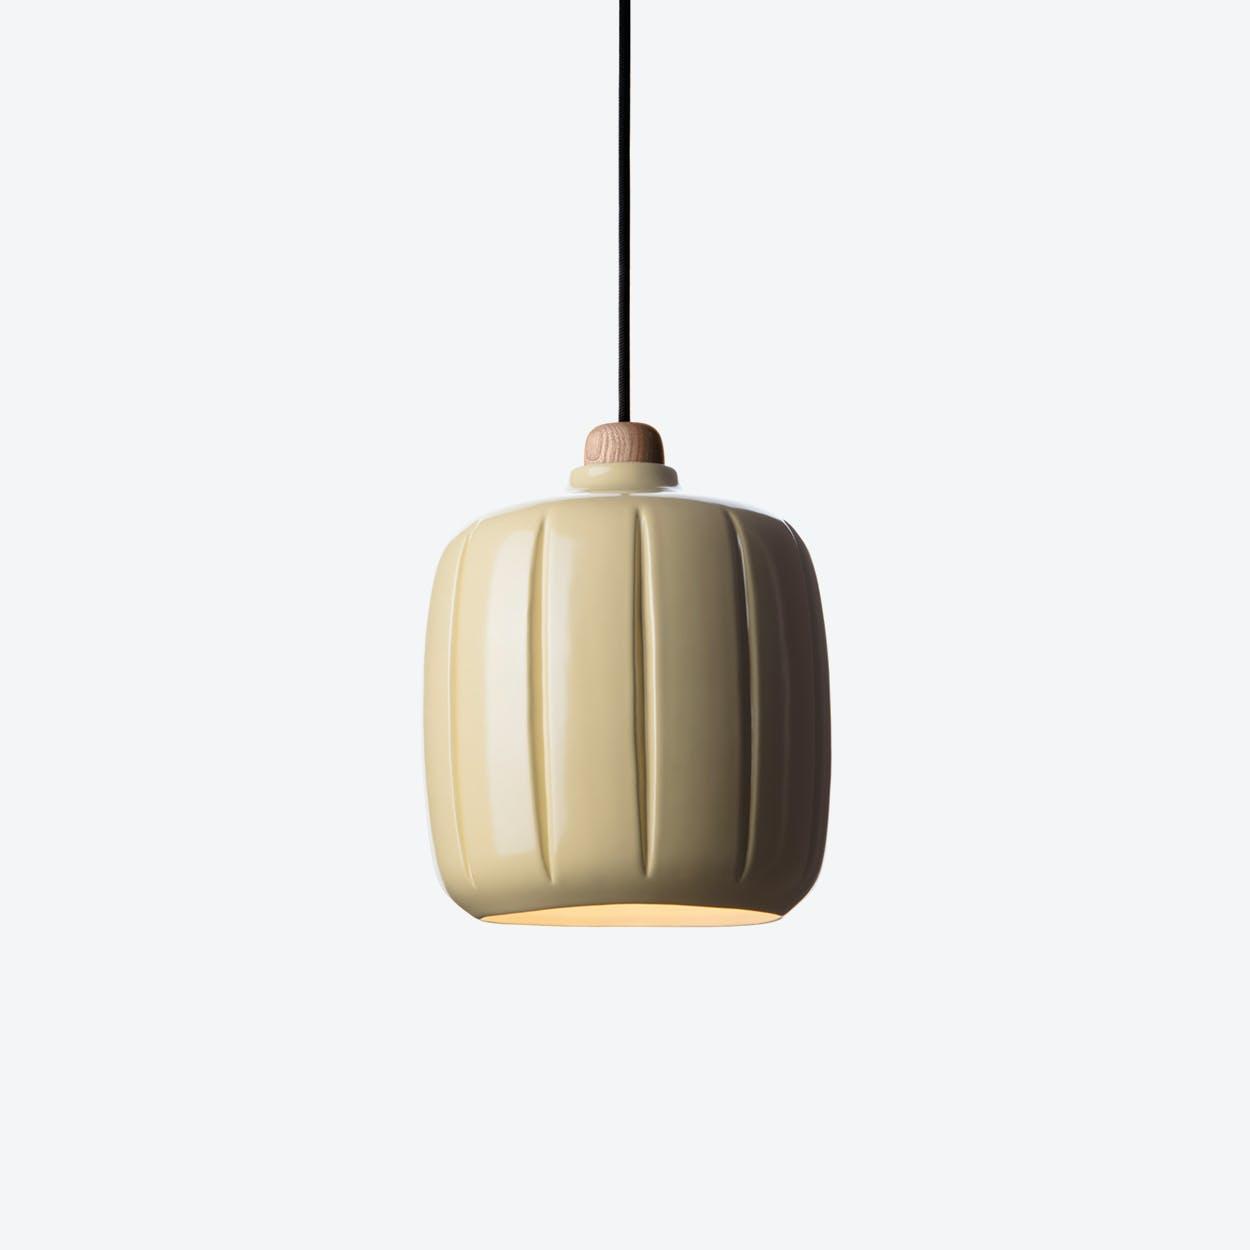 Cosse Small Pendant Lamp in Yellow